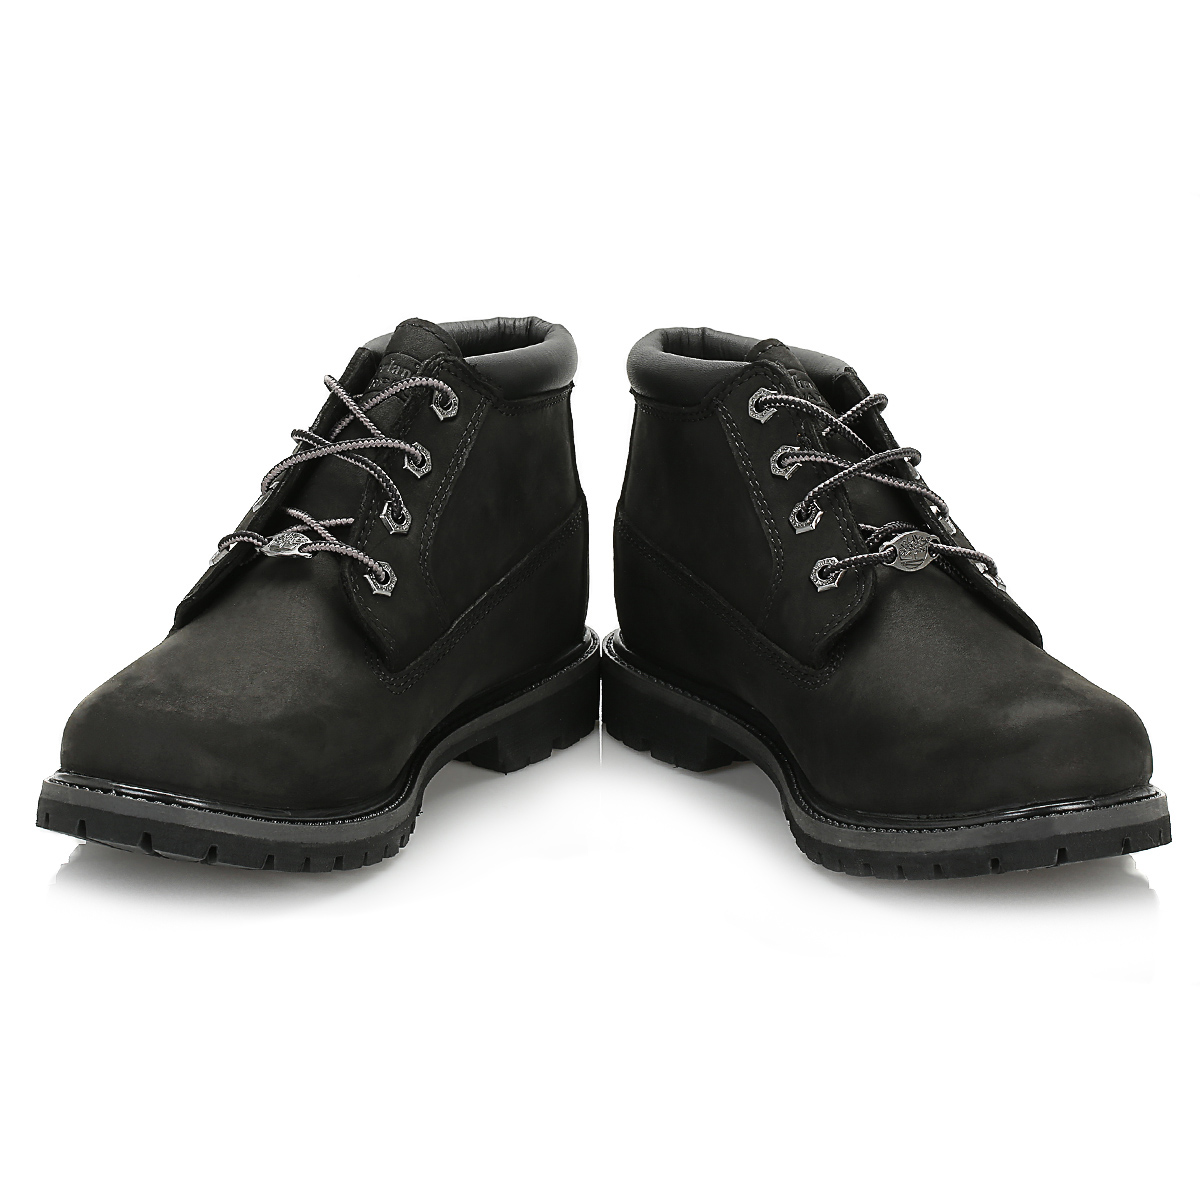 Cool Timberland Womenu0026#39;s Joslin Chukka A145P Nubuck Lace Up Boots Brown   EBay